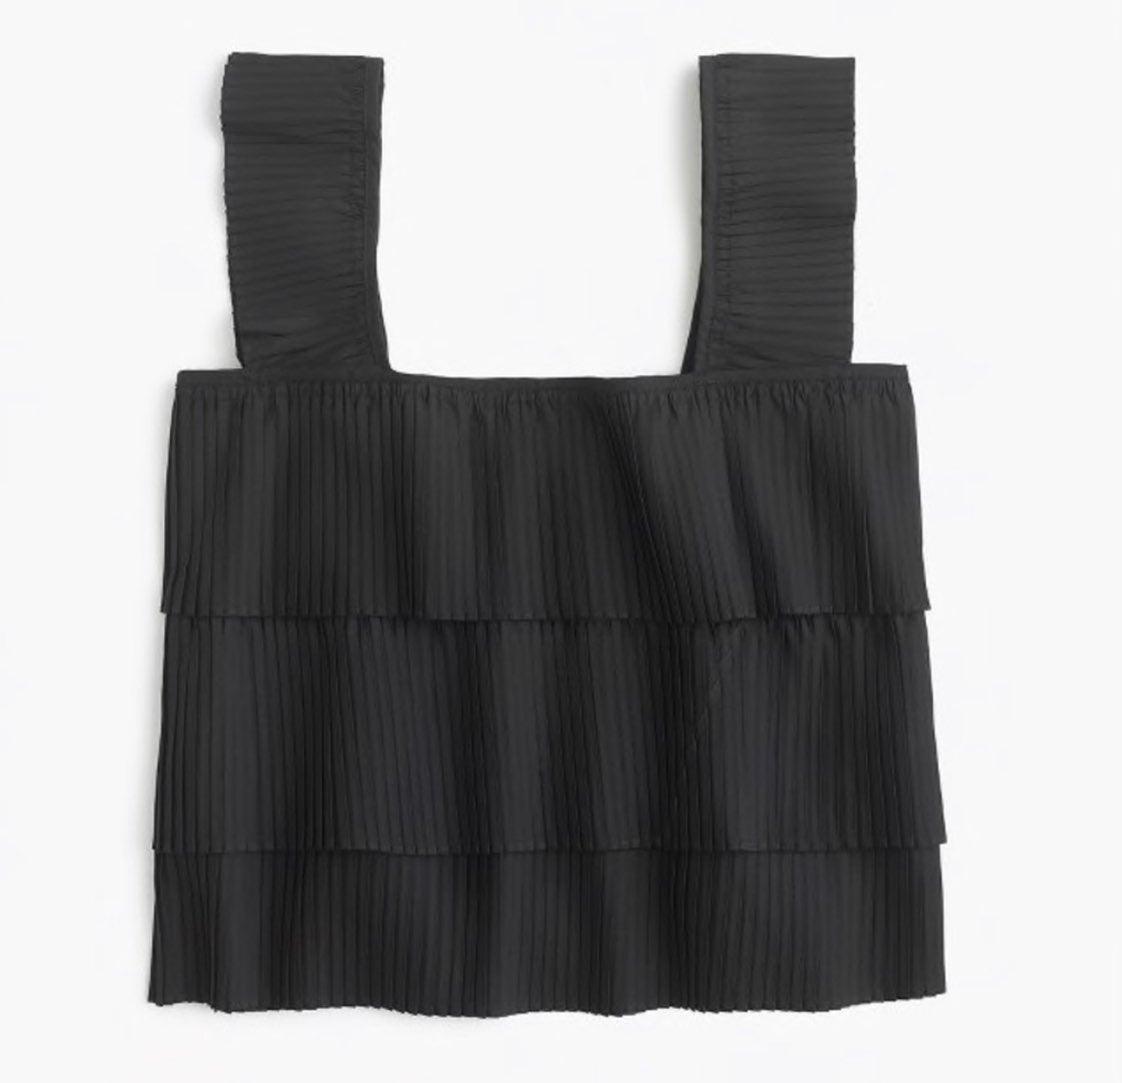 Jcrew women's ruffled sleeveless top